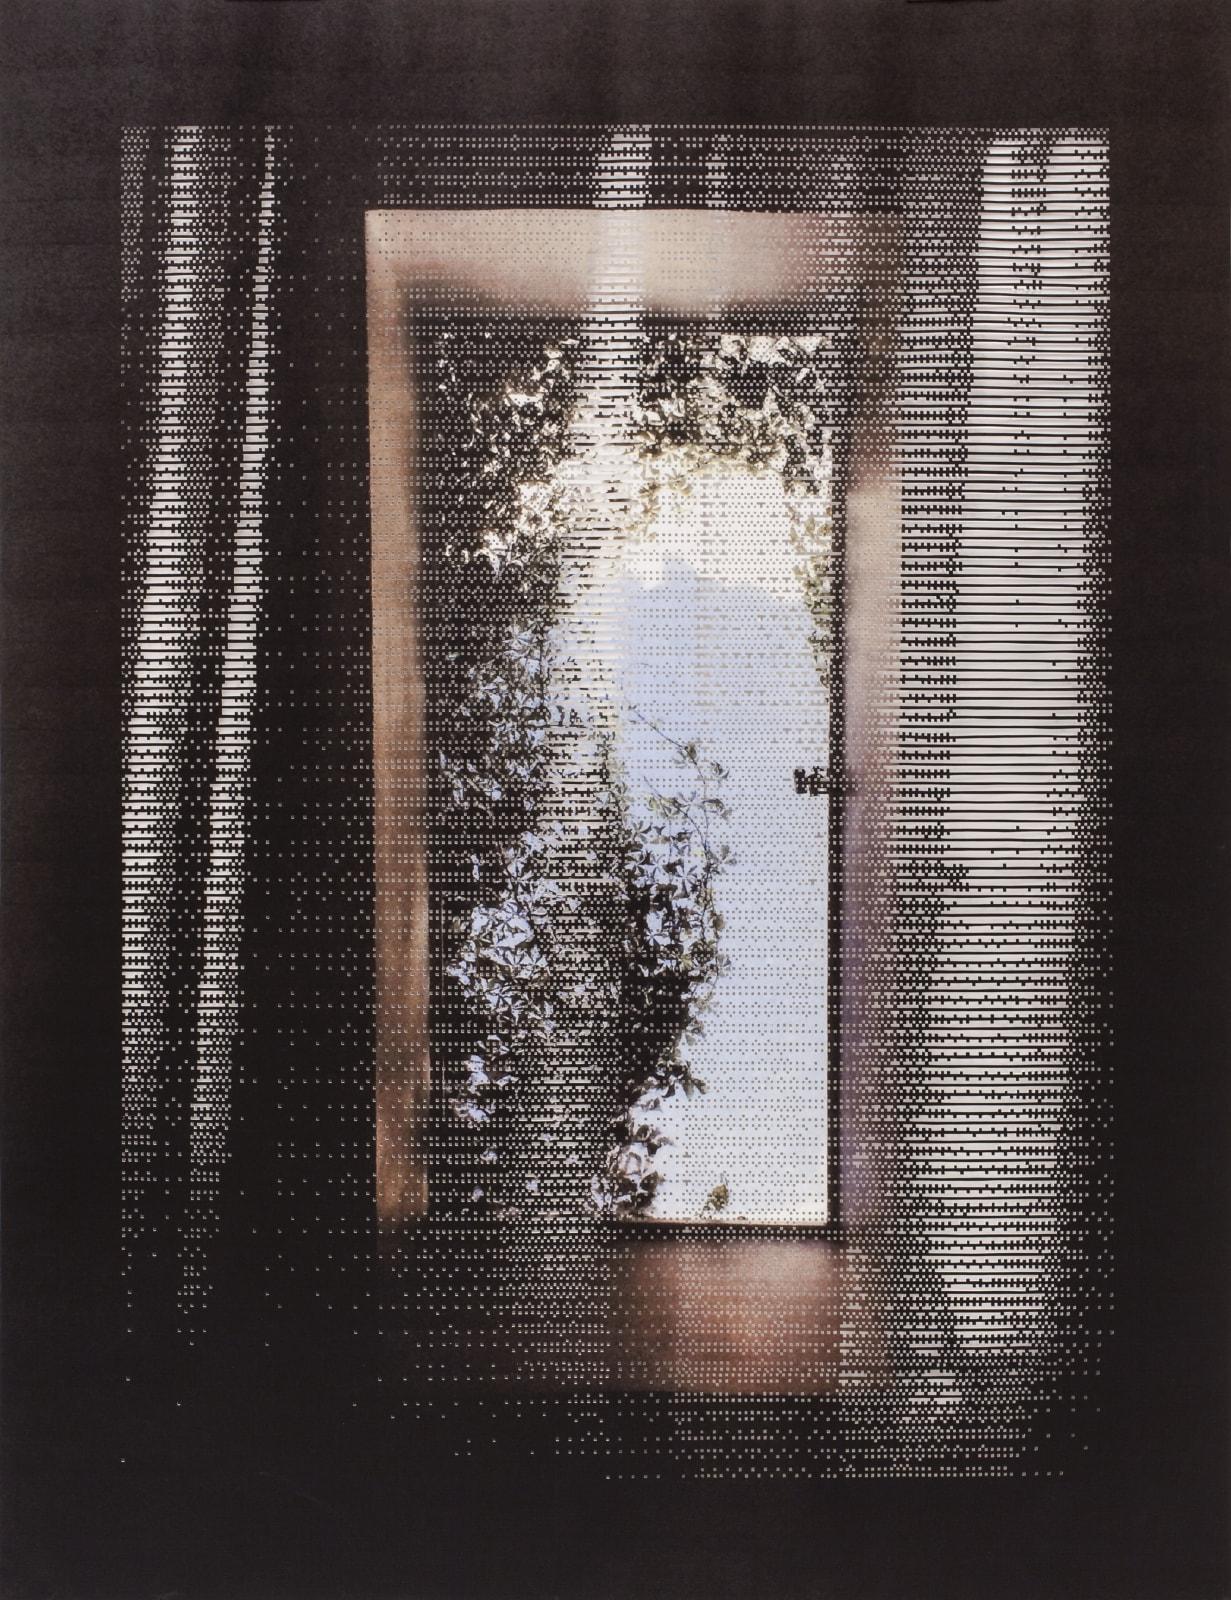 Caroline Jane Harris, Shroud, 2018 Hand-cut archival pigment print on paper installation 130 x 100 cm